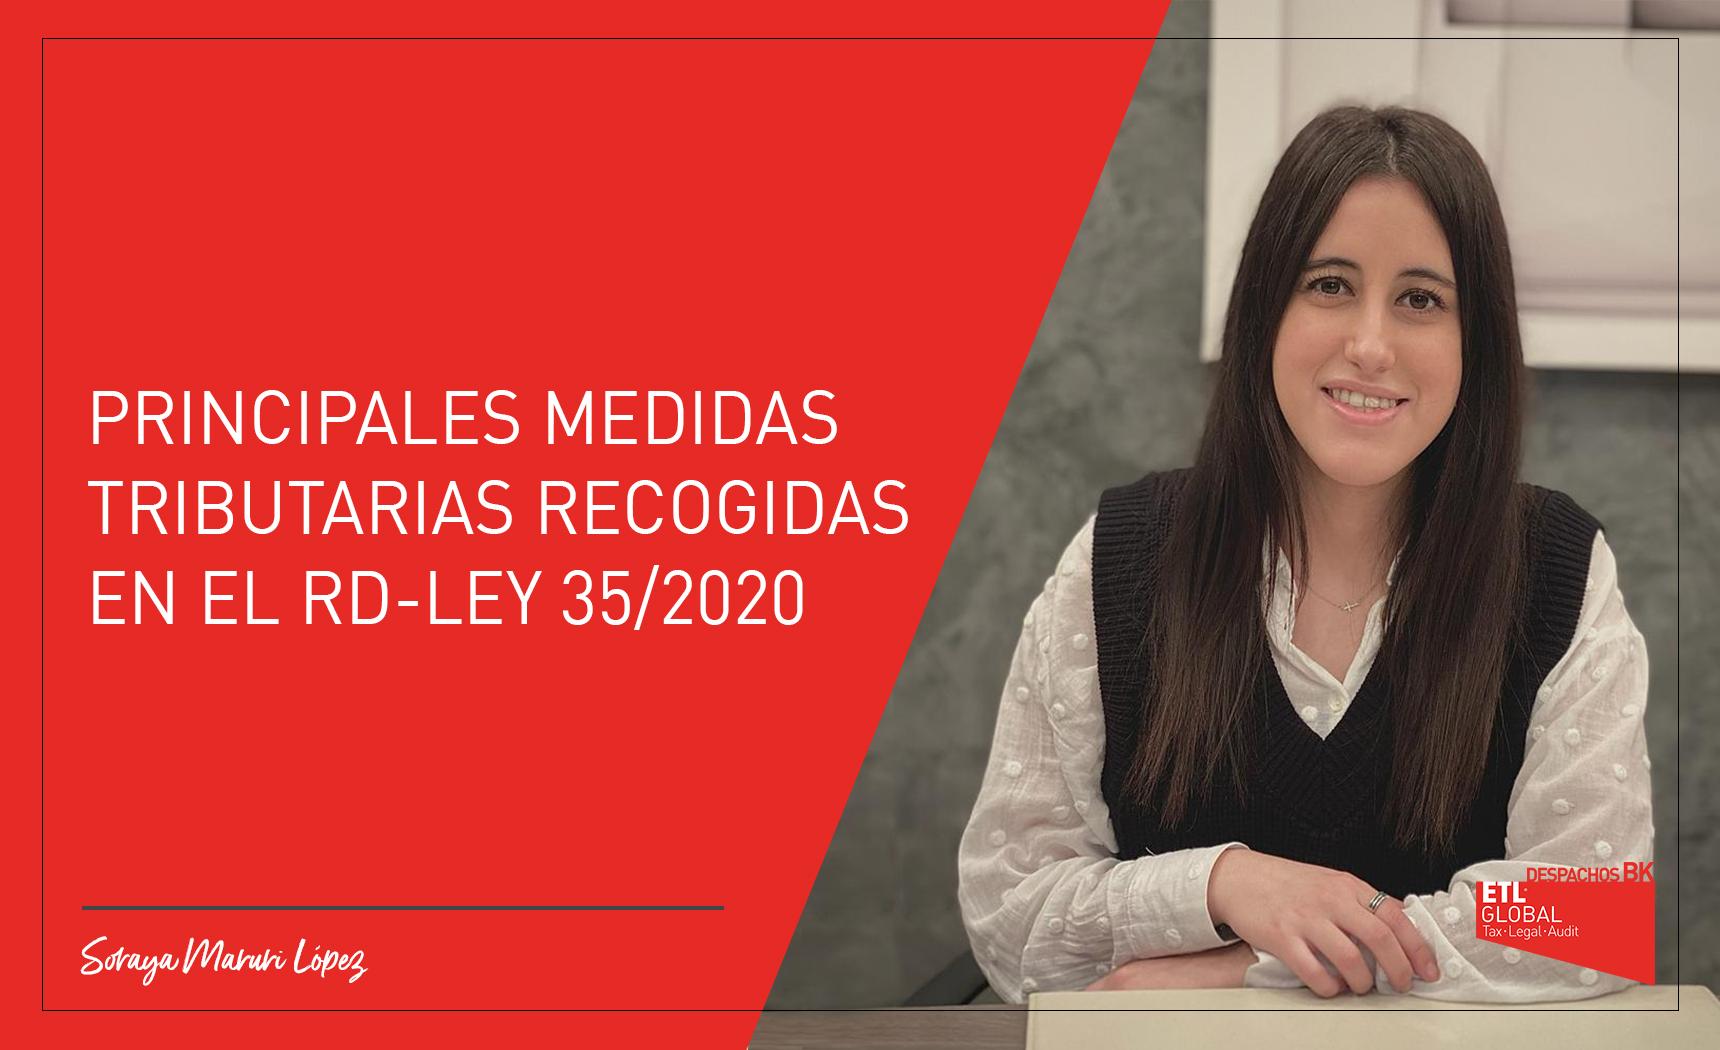 RD 35/2020